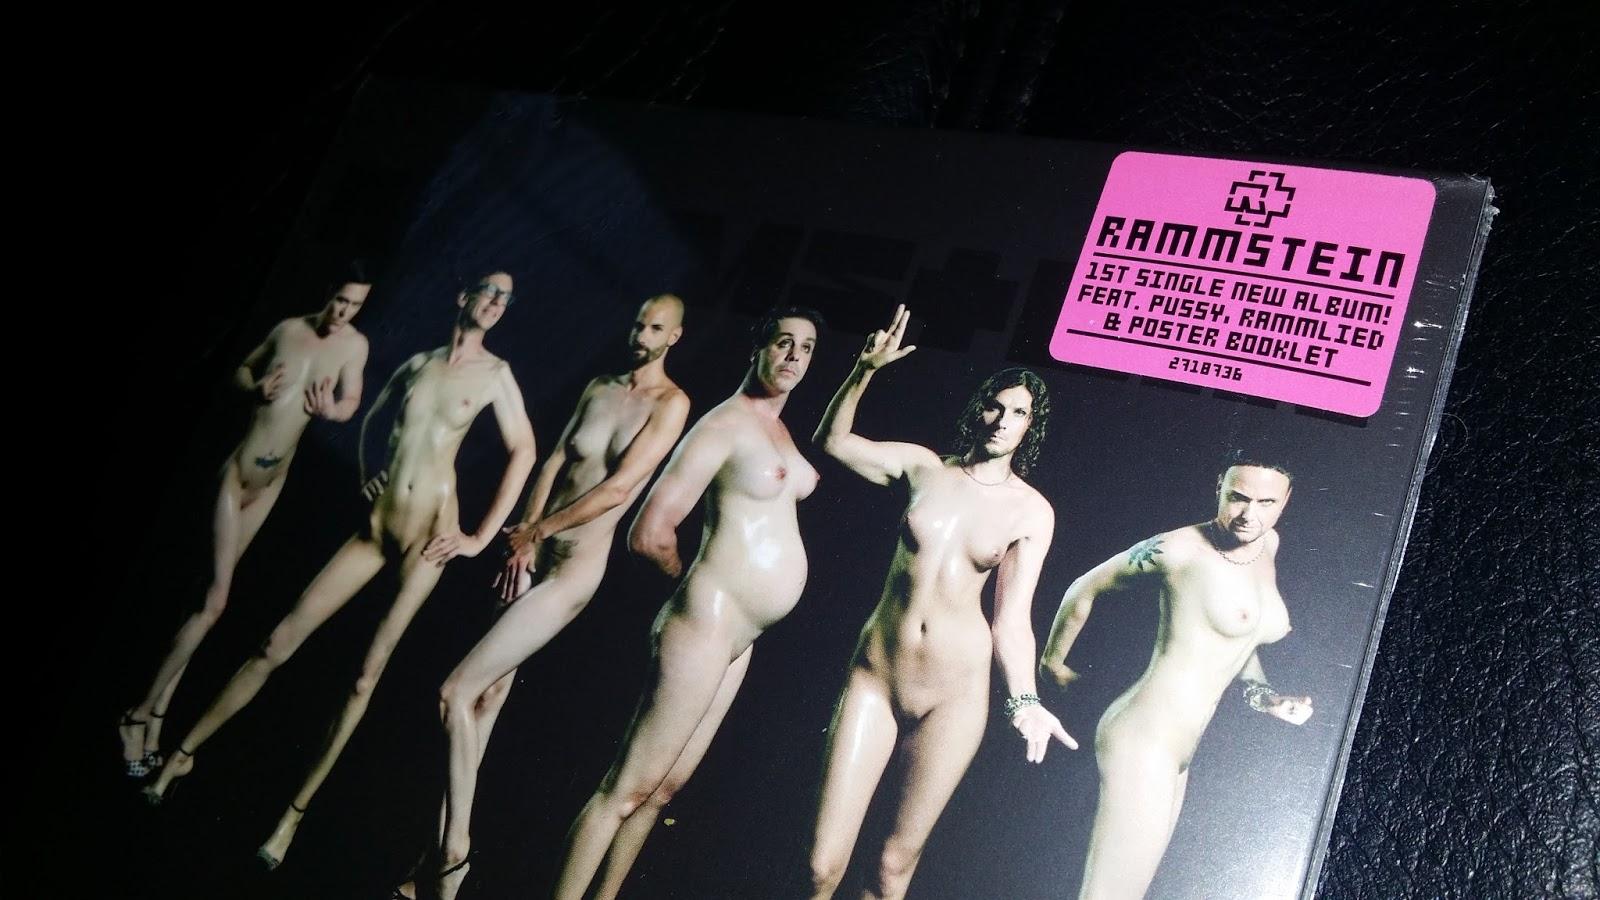 horny-rammstein-pussy-music-video-fuck-girl